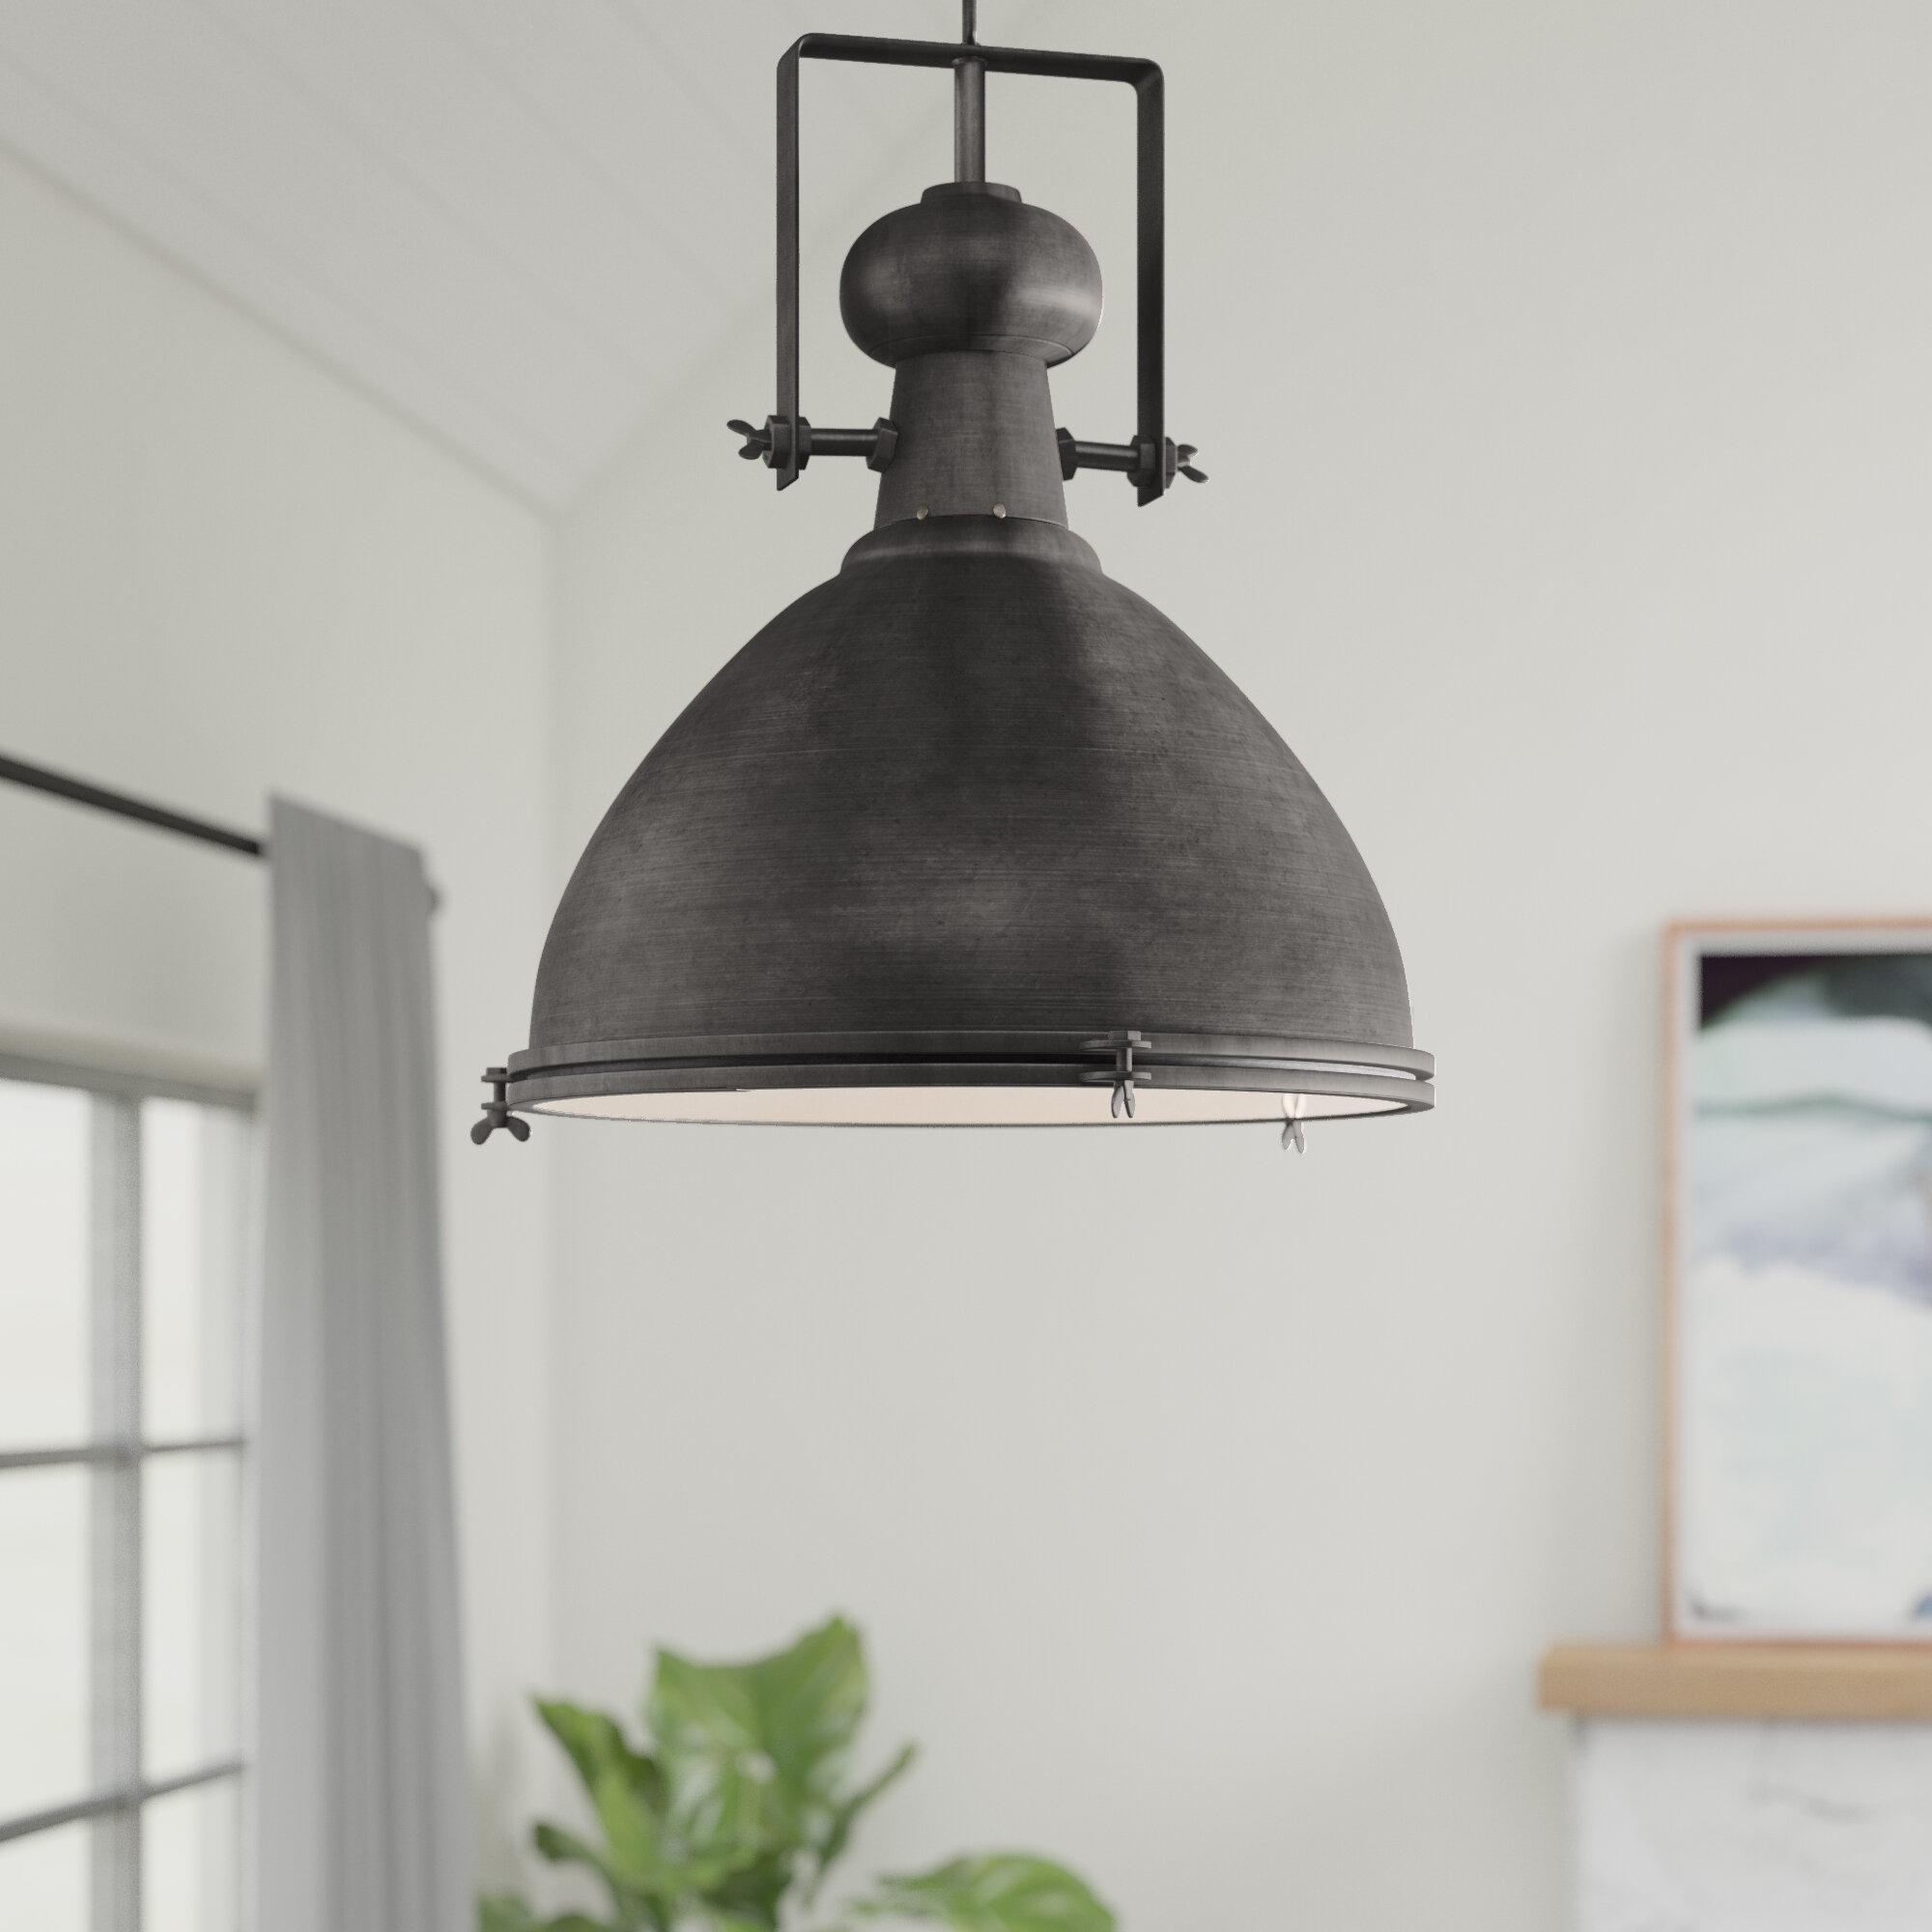 Lavern 1 Light Single Dome Pendant With Regard To Grullon Scroll 1 Light Single Bell Pendants (View 3 of 30)